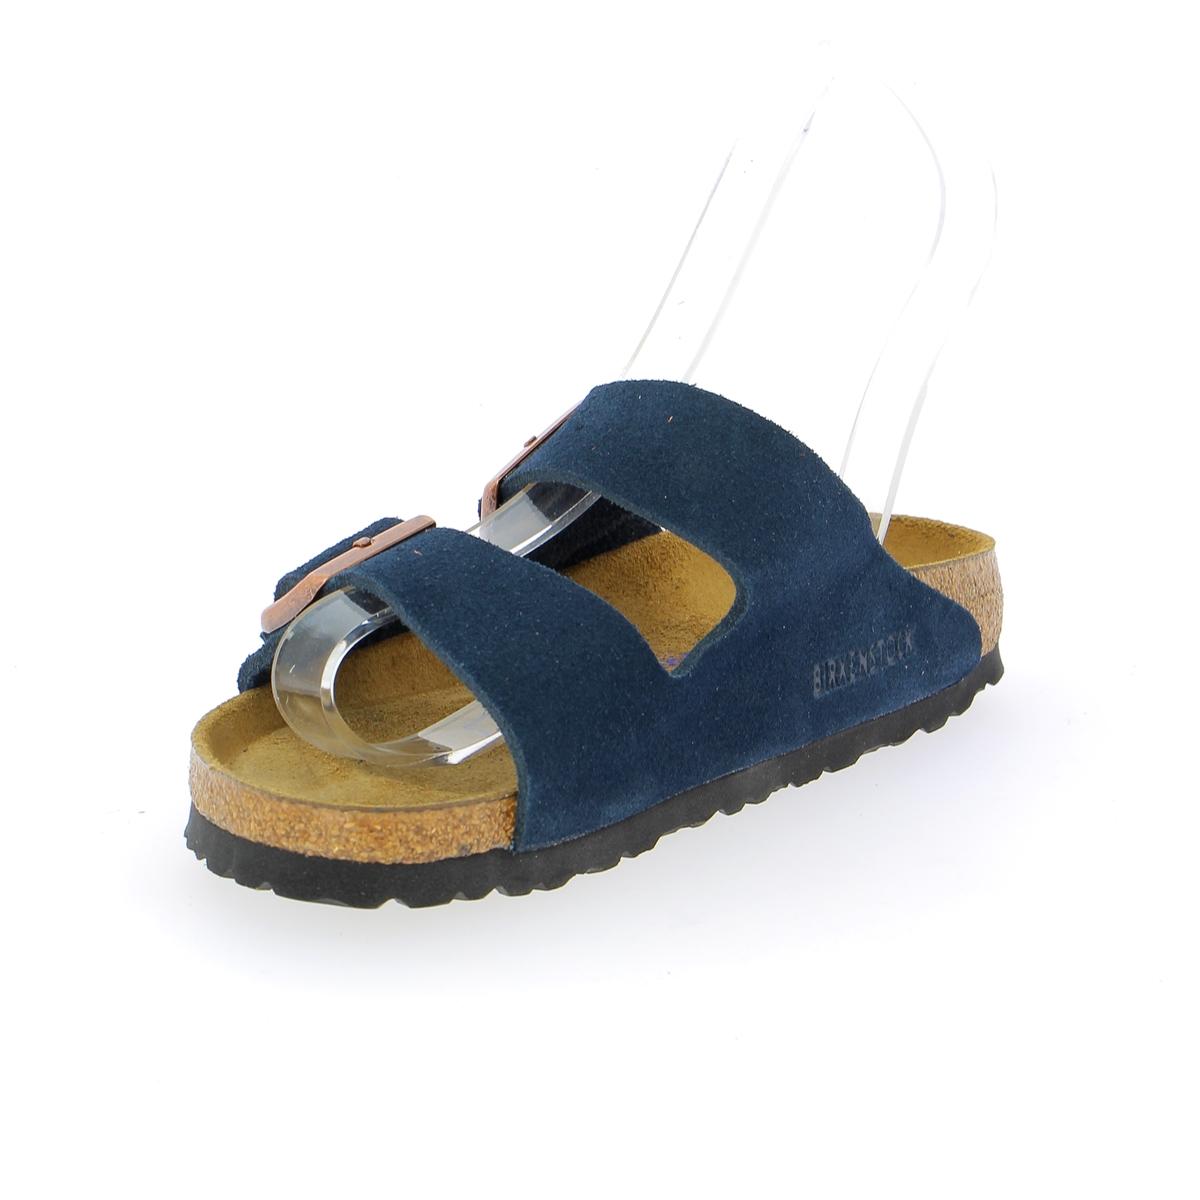 Birkenstock Mulles bleu